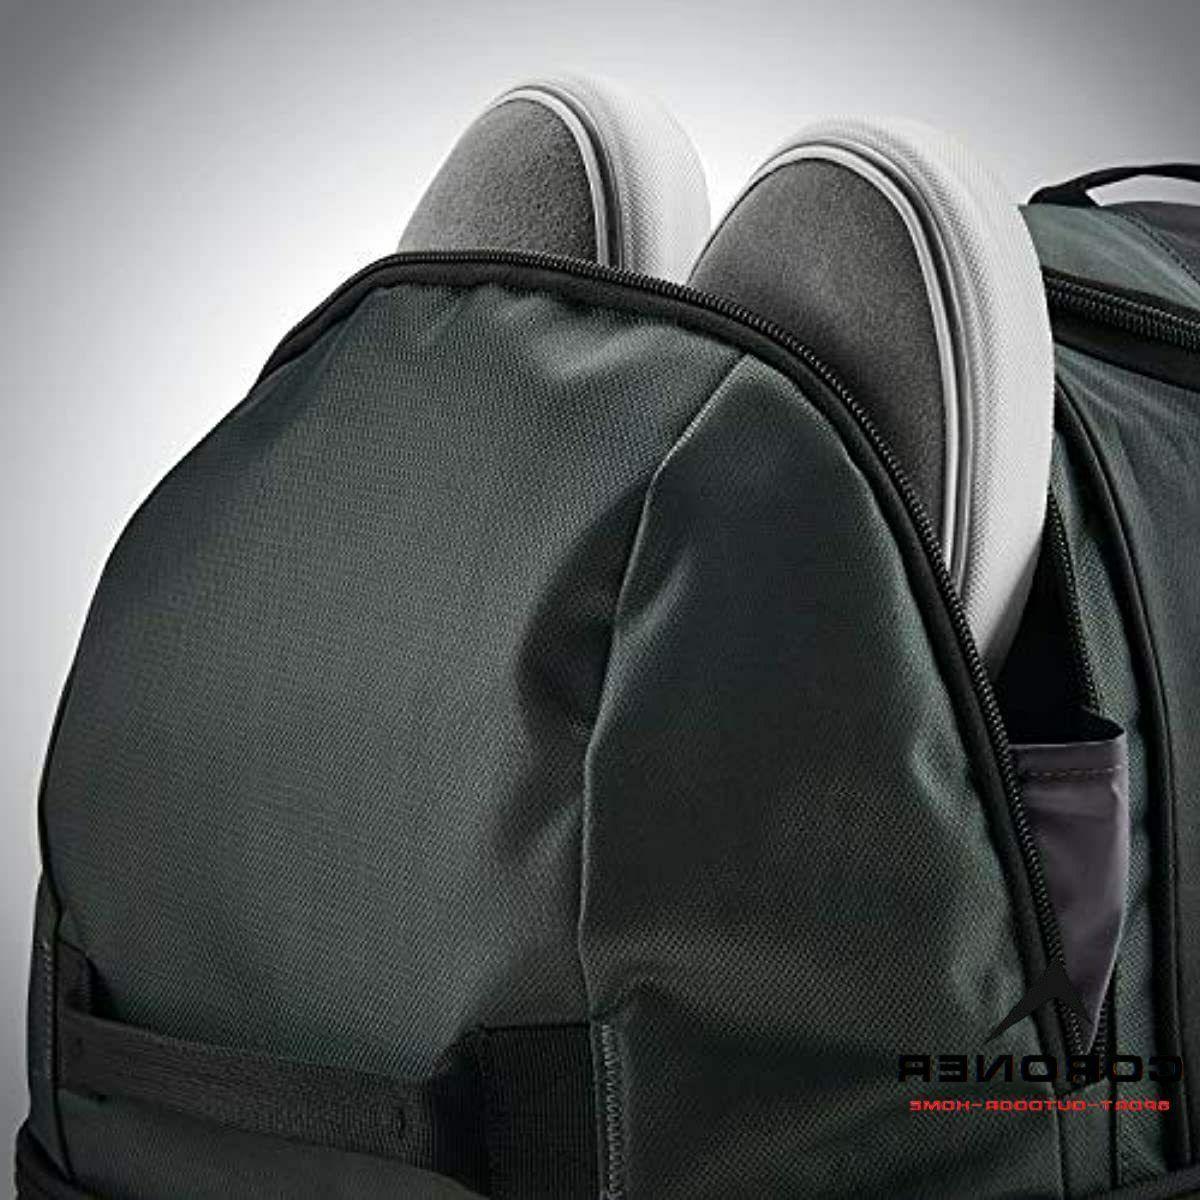 Samsonite 2 Bottom Wheeled Rolling Bag,